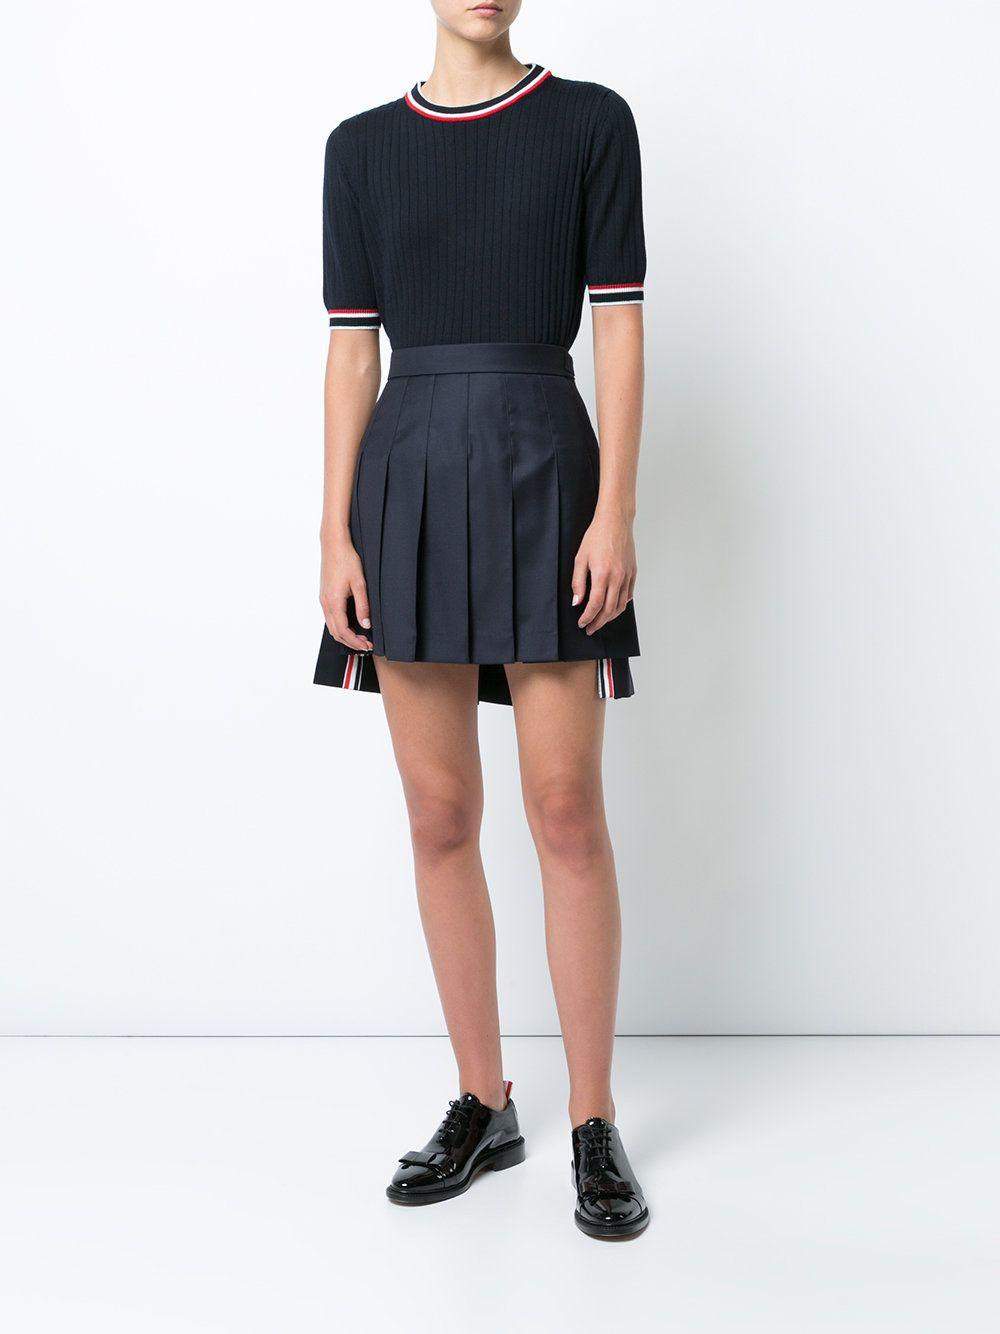 b50750820 Thom Browne Dropped-Back Mini Pleated Skirt in Navy Super 130's Wool Twill